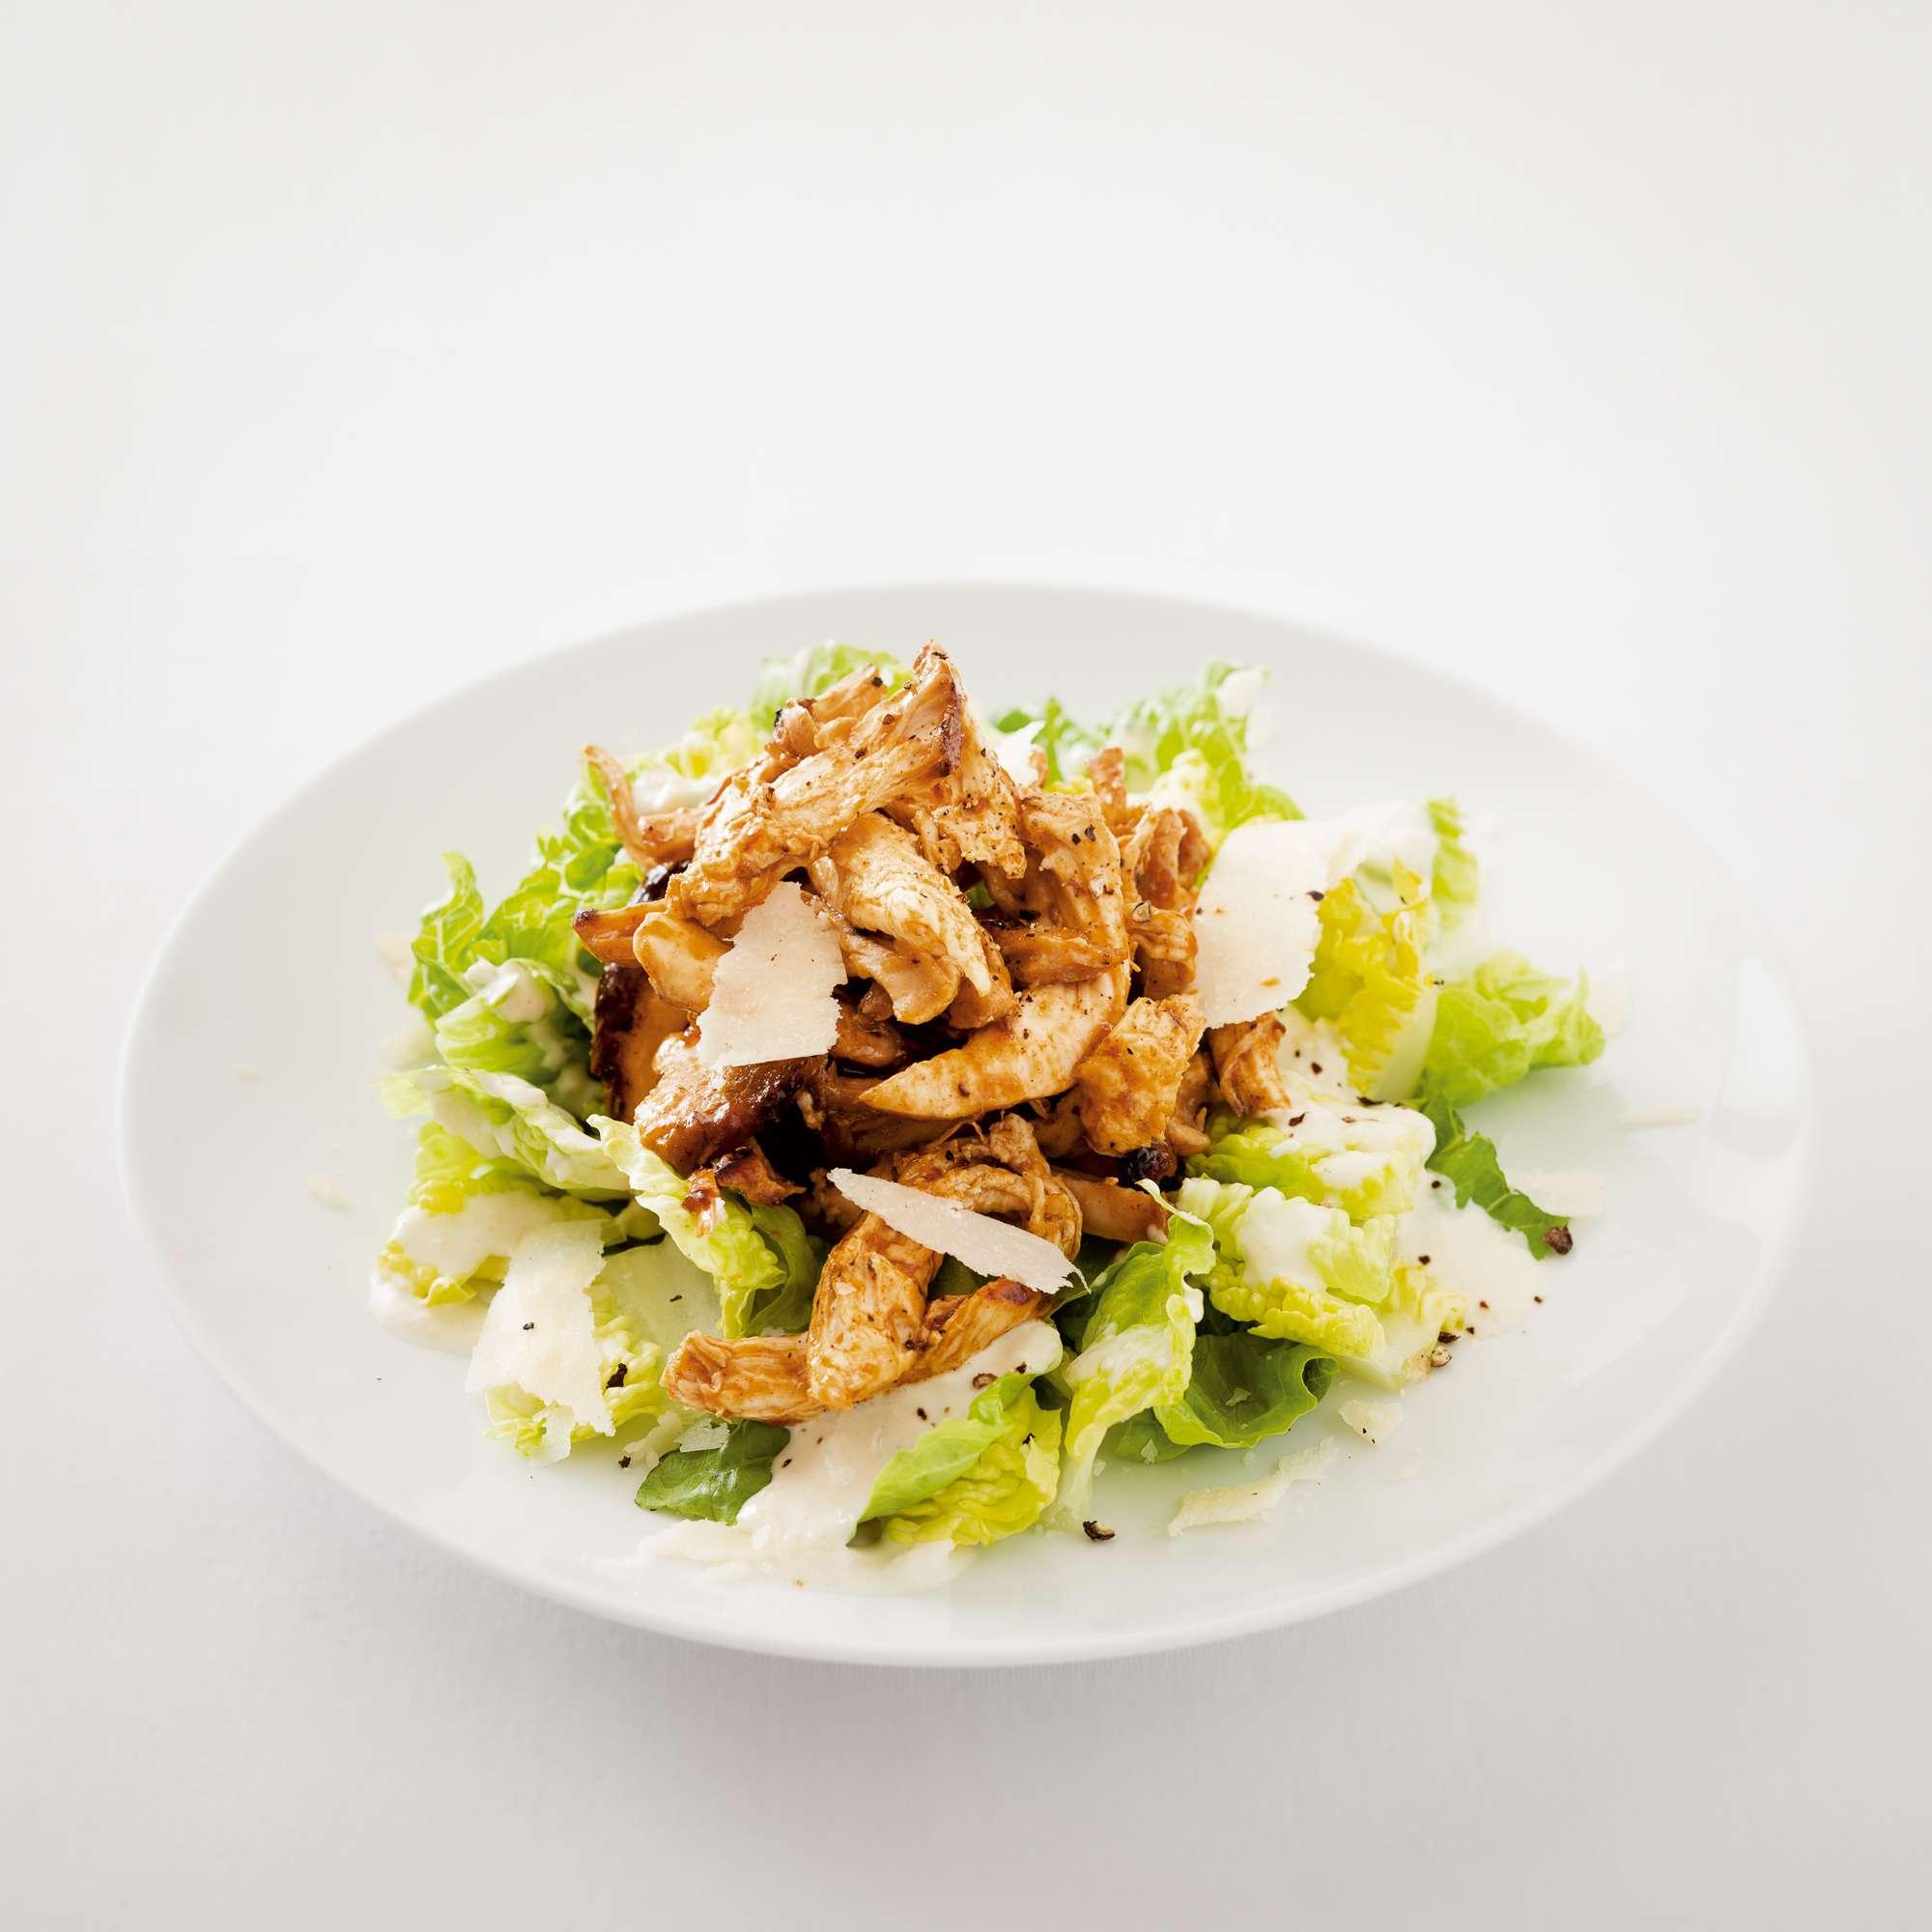 Caesar Salad mit Pulled Chicken, Foto: © Andrea Thode/Effilee